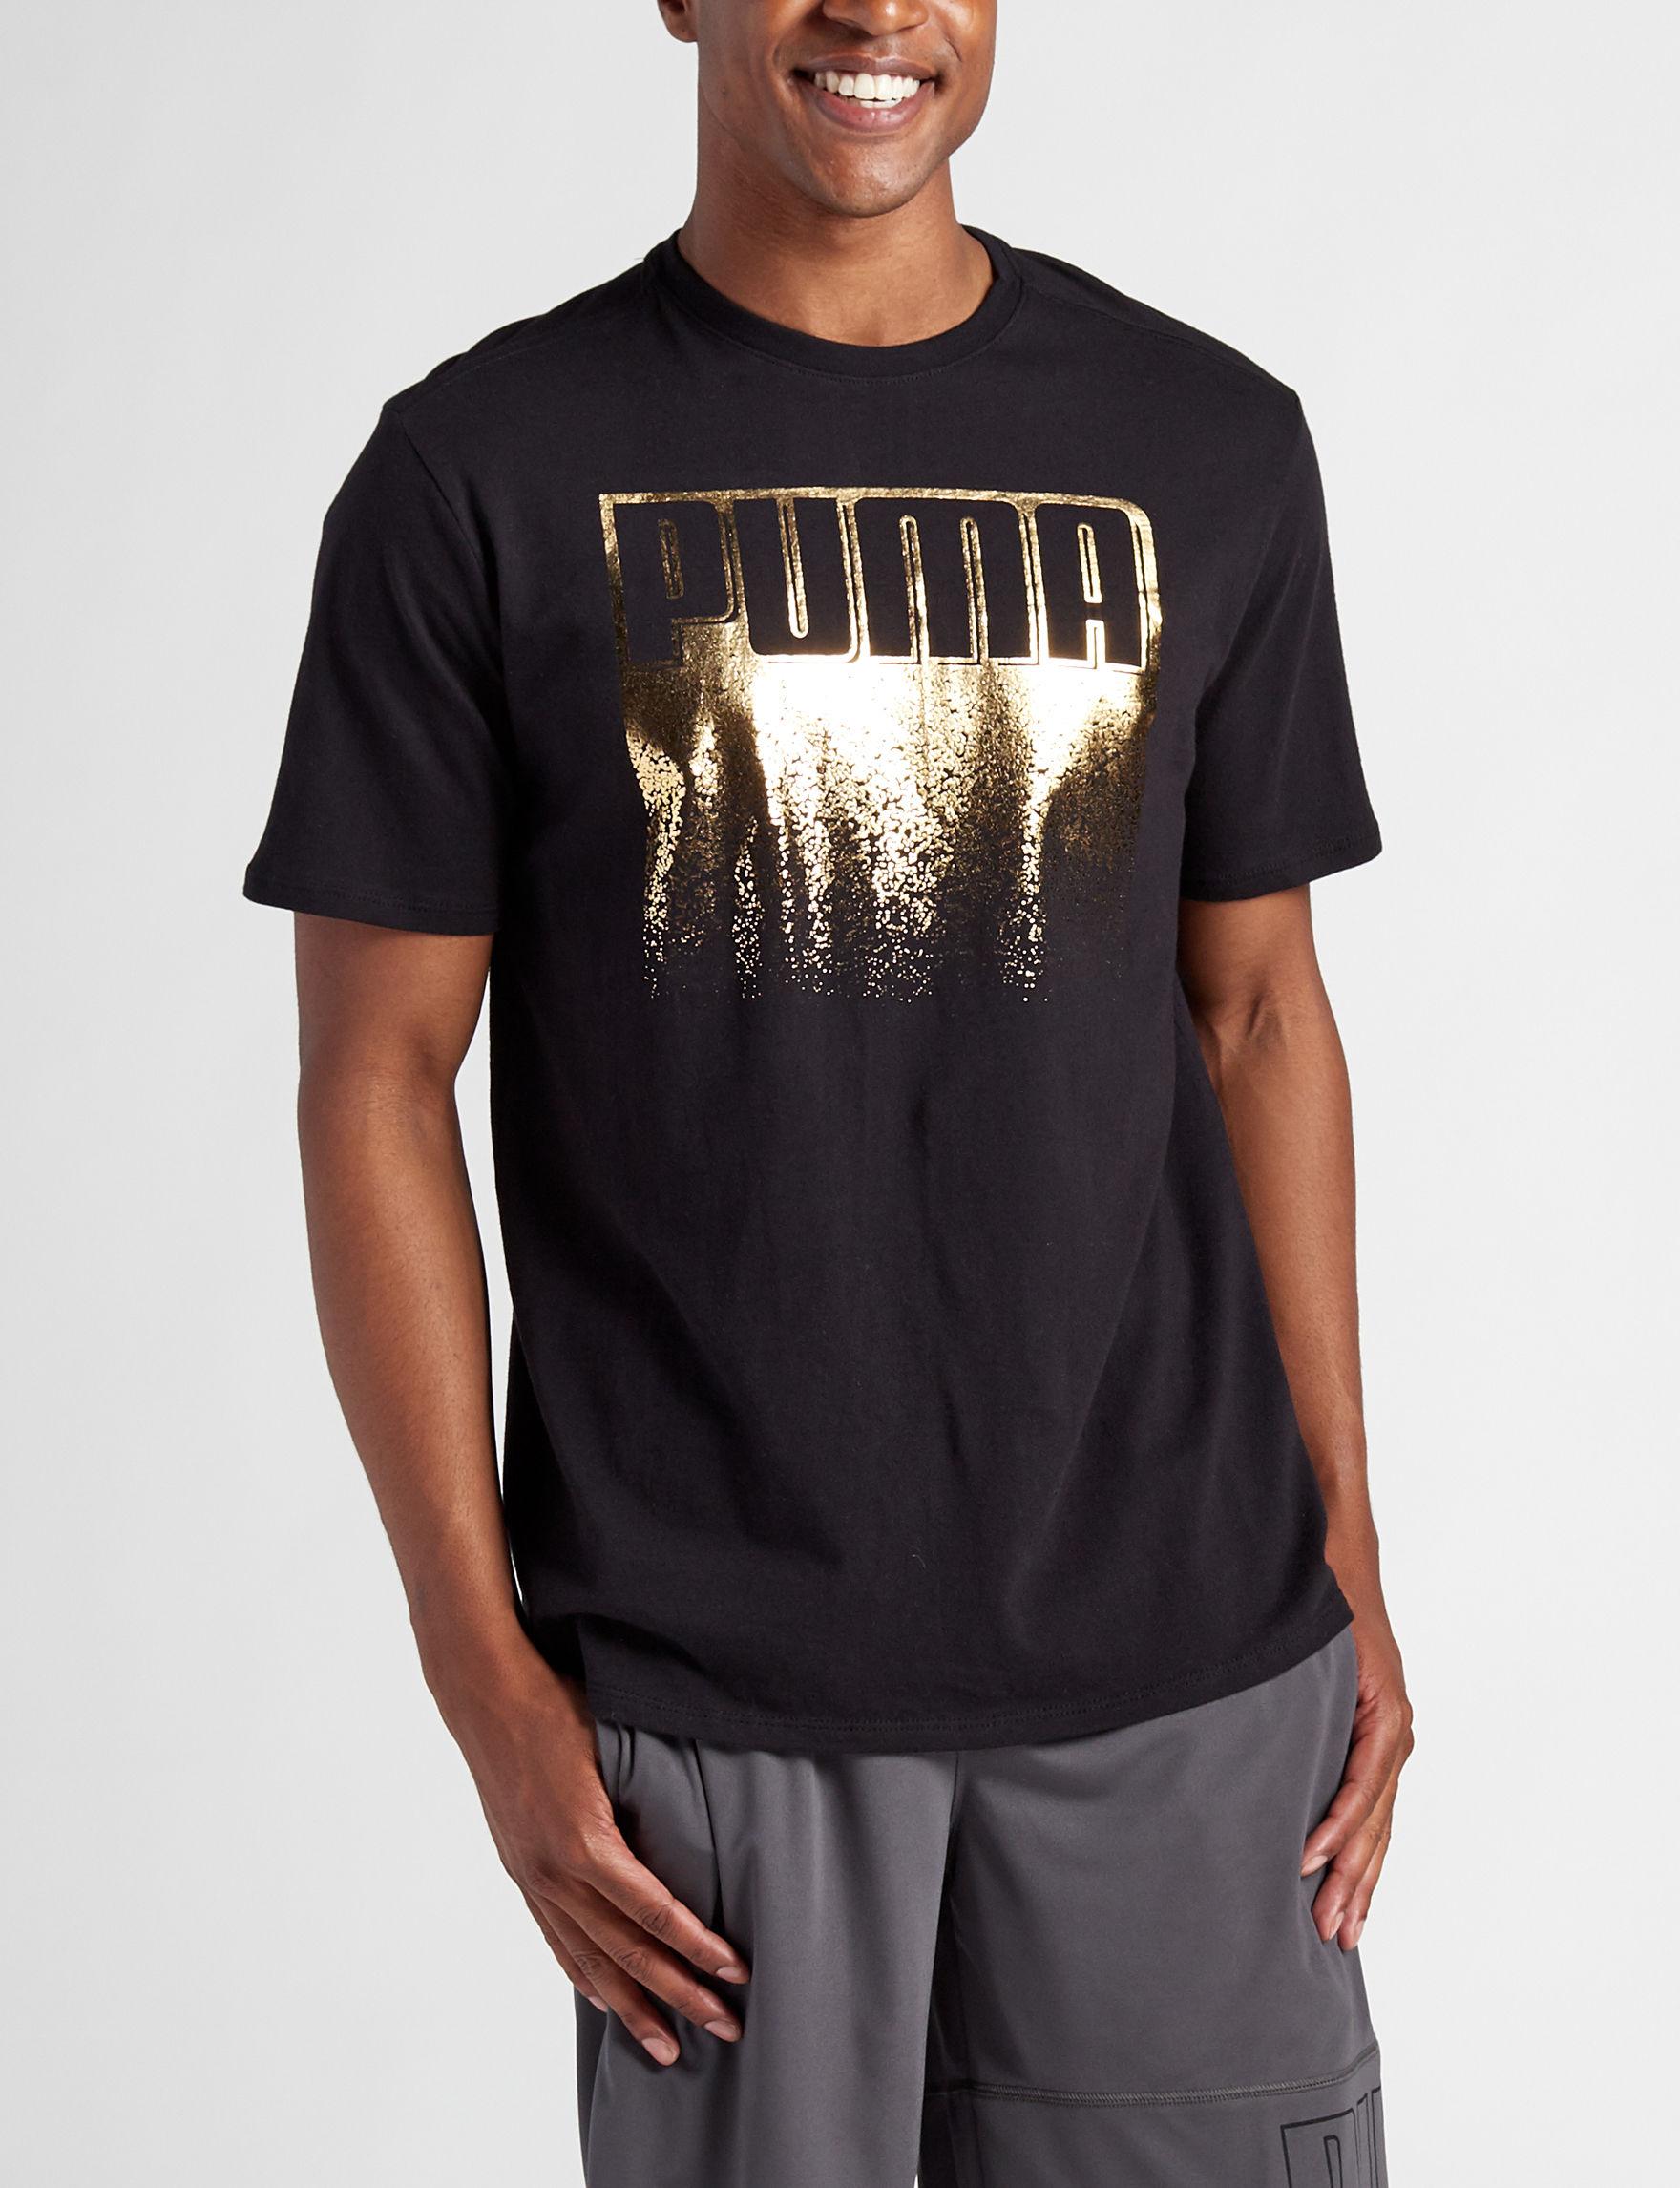 Puma Black / Gold